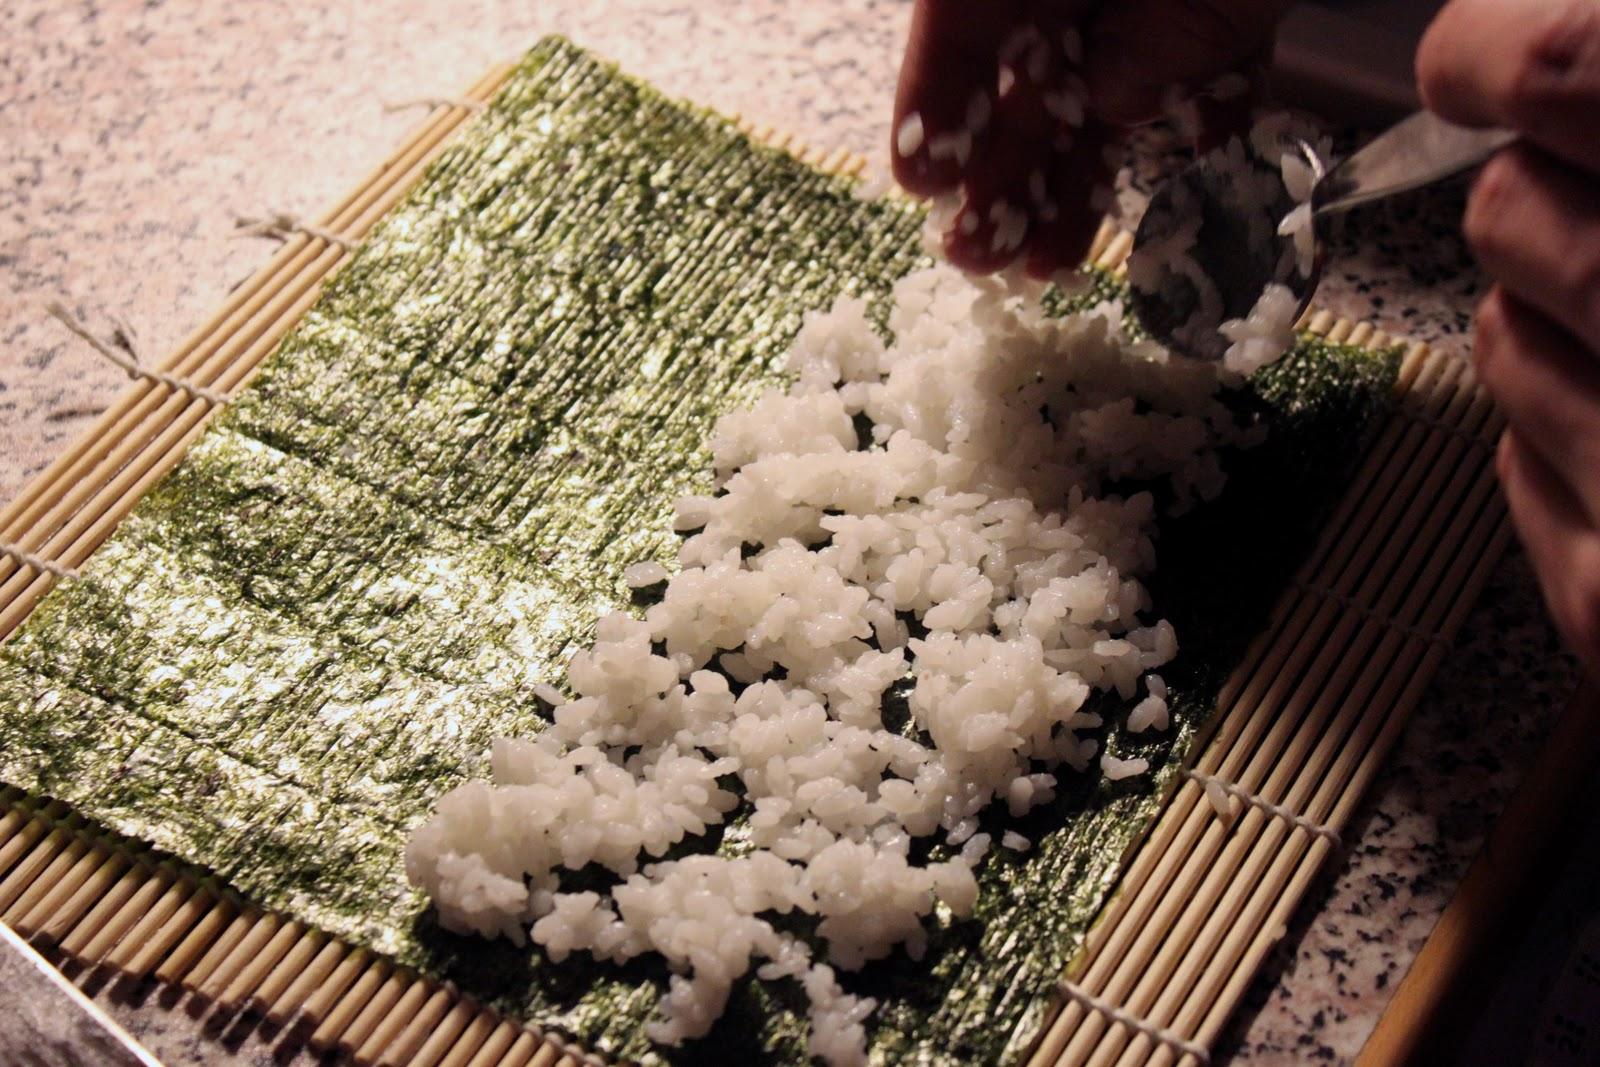 Blue dragon sushi paketti